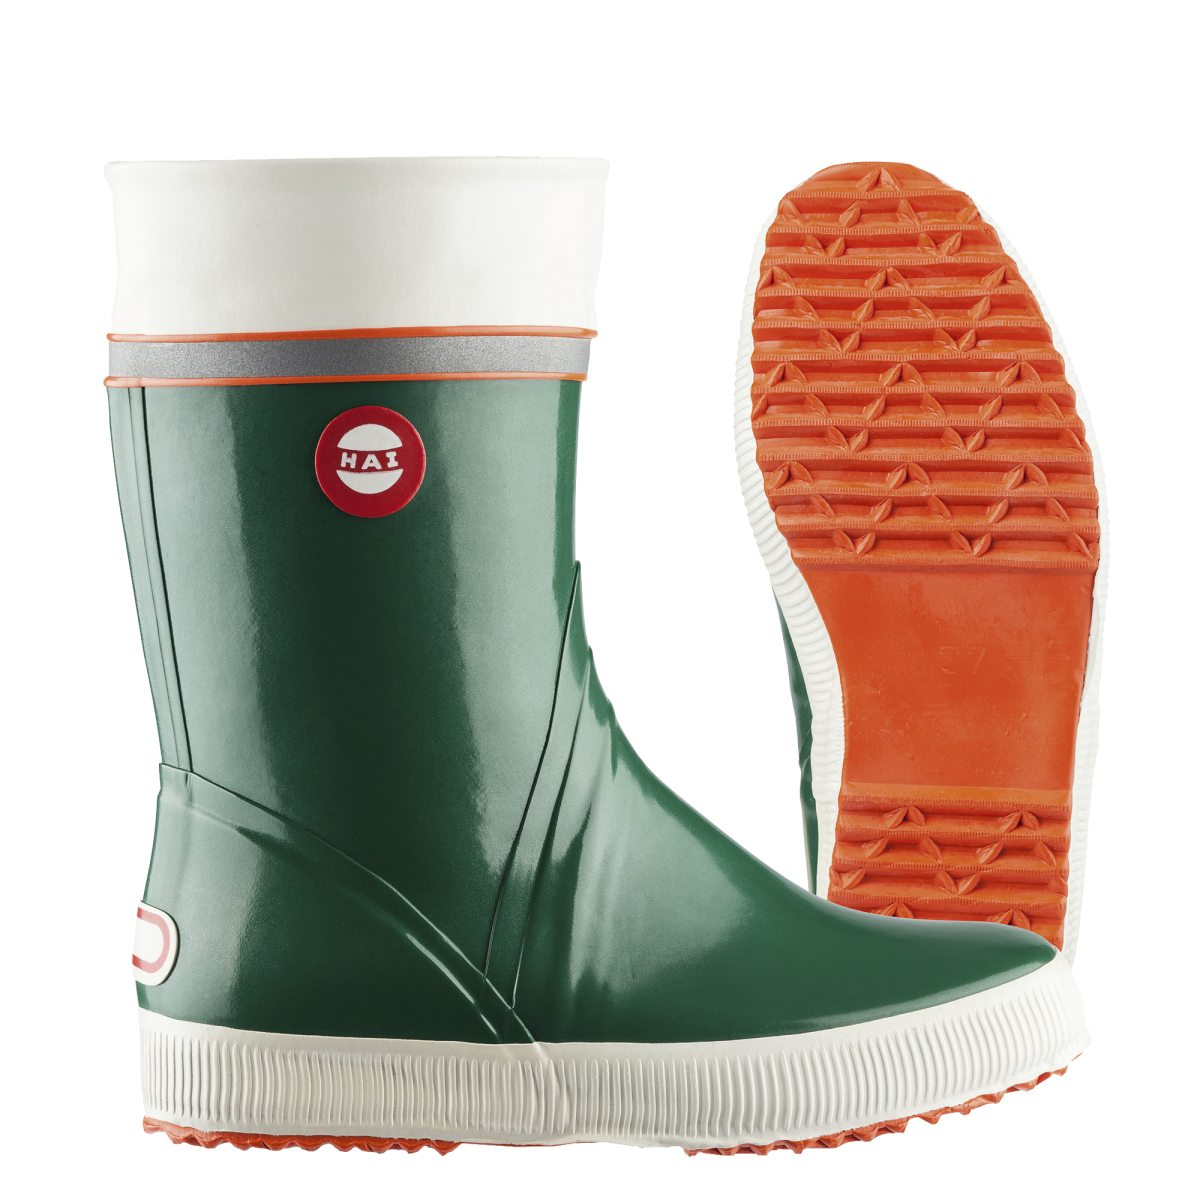 c2504286bde grön nokian footwear hai mörk blå gummistövel green tricolor gummistövlar  herr